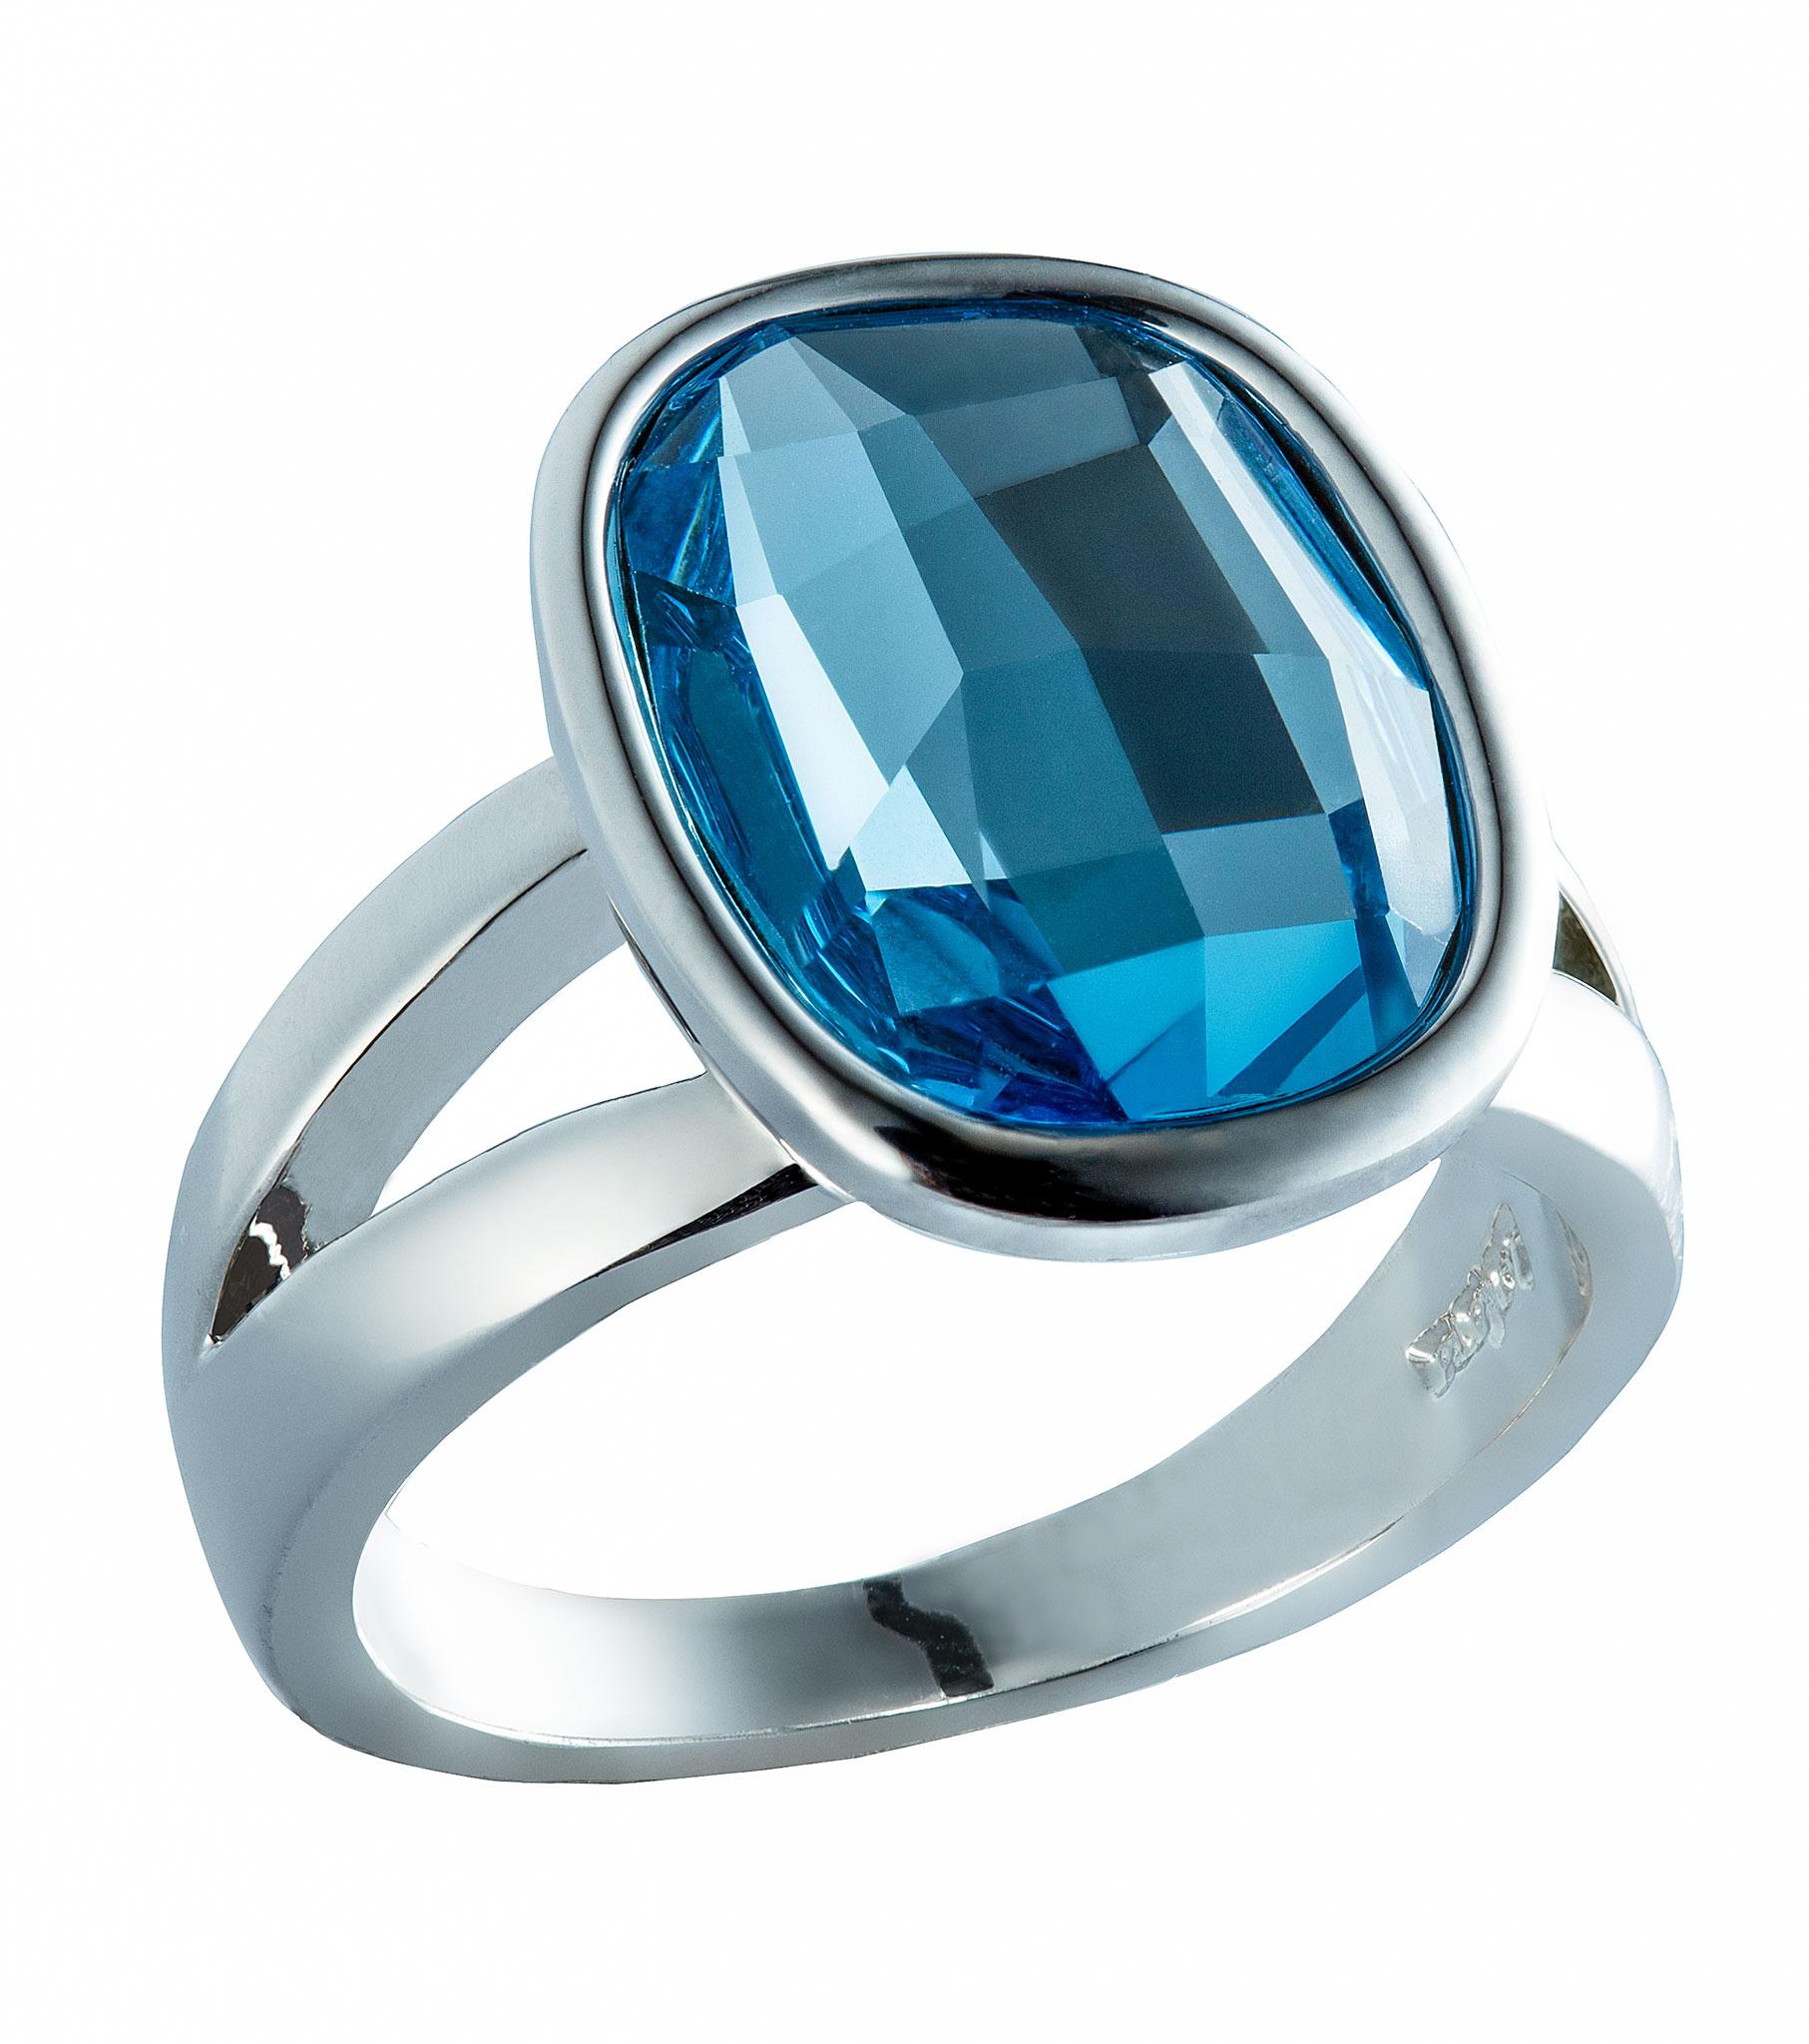 Blue ring packshot, jewelry photohraphy